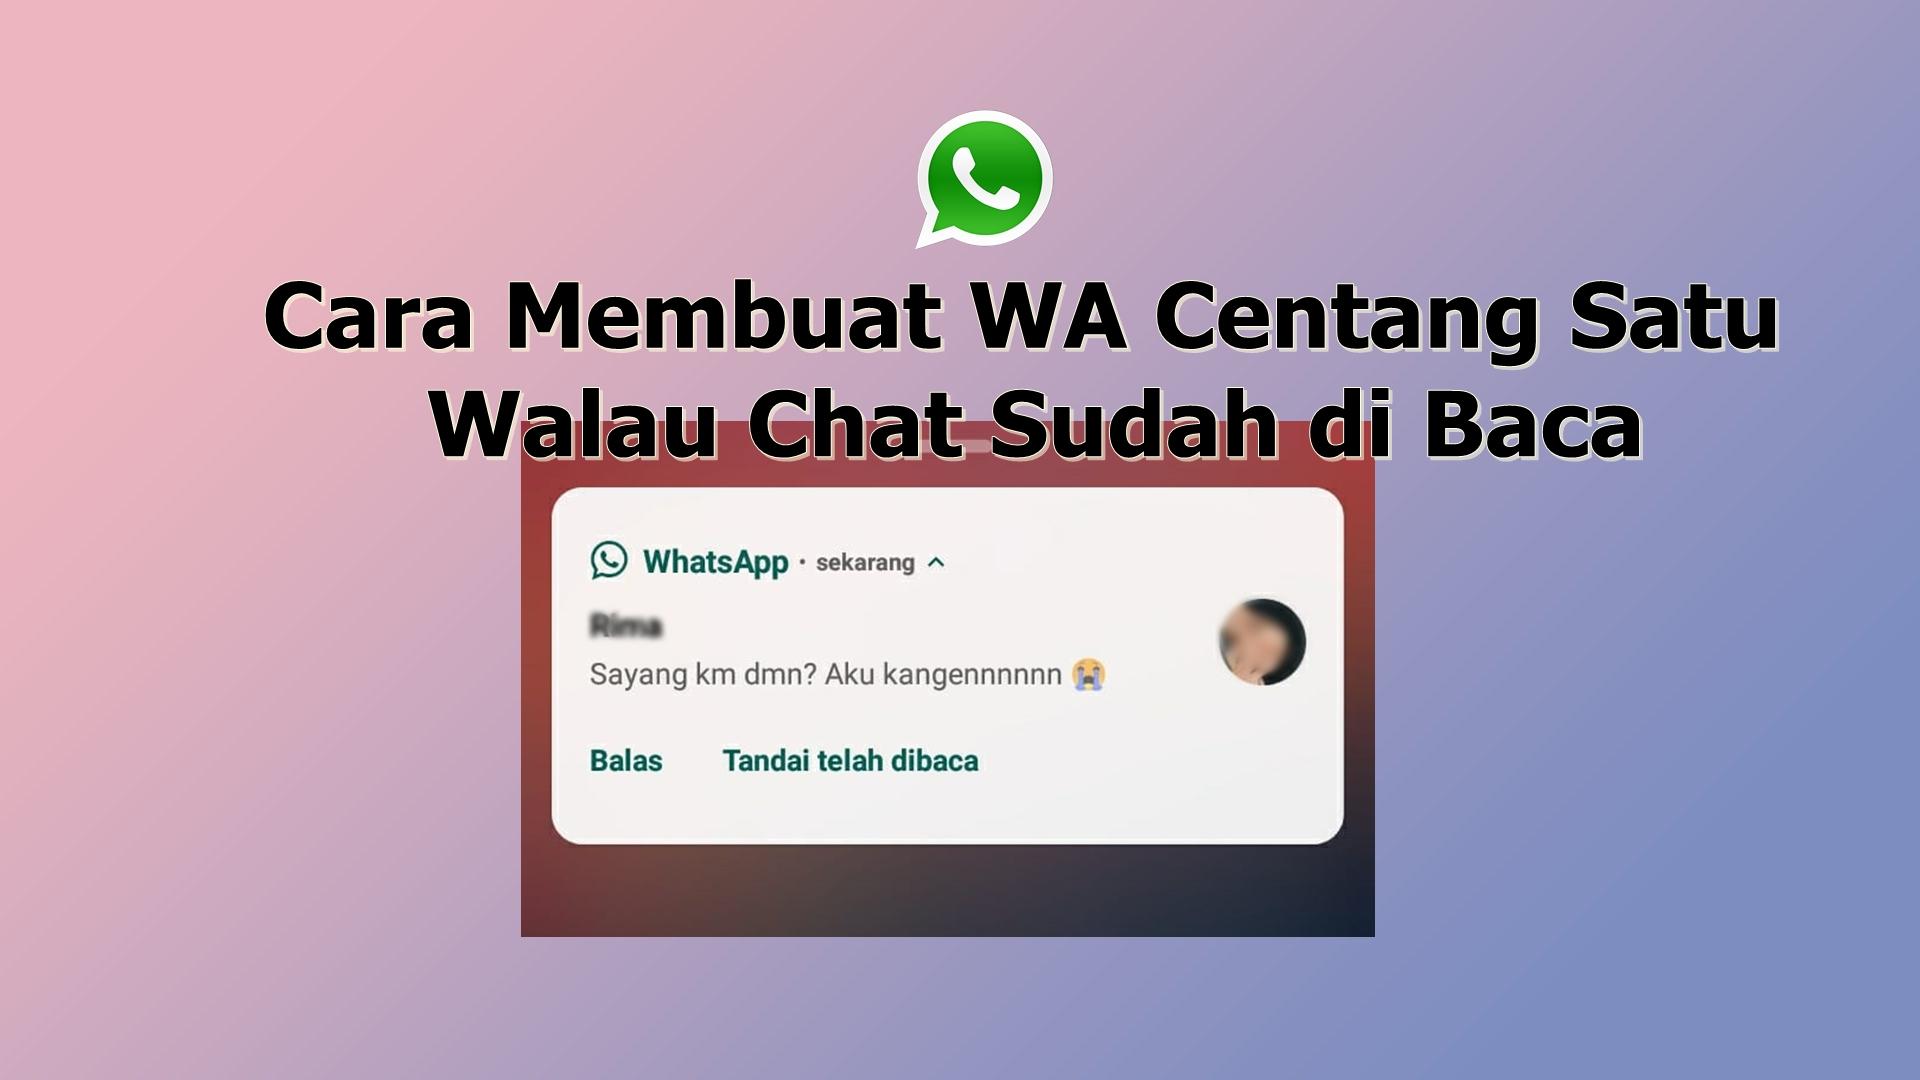 Cara Membuat WA Centang Satu Walau Chat Sudah di Baca